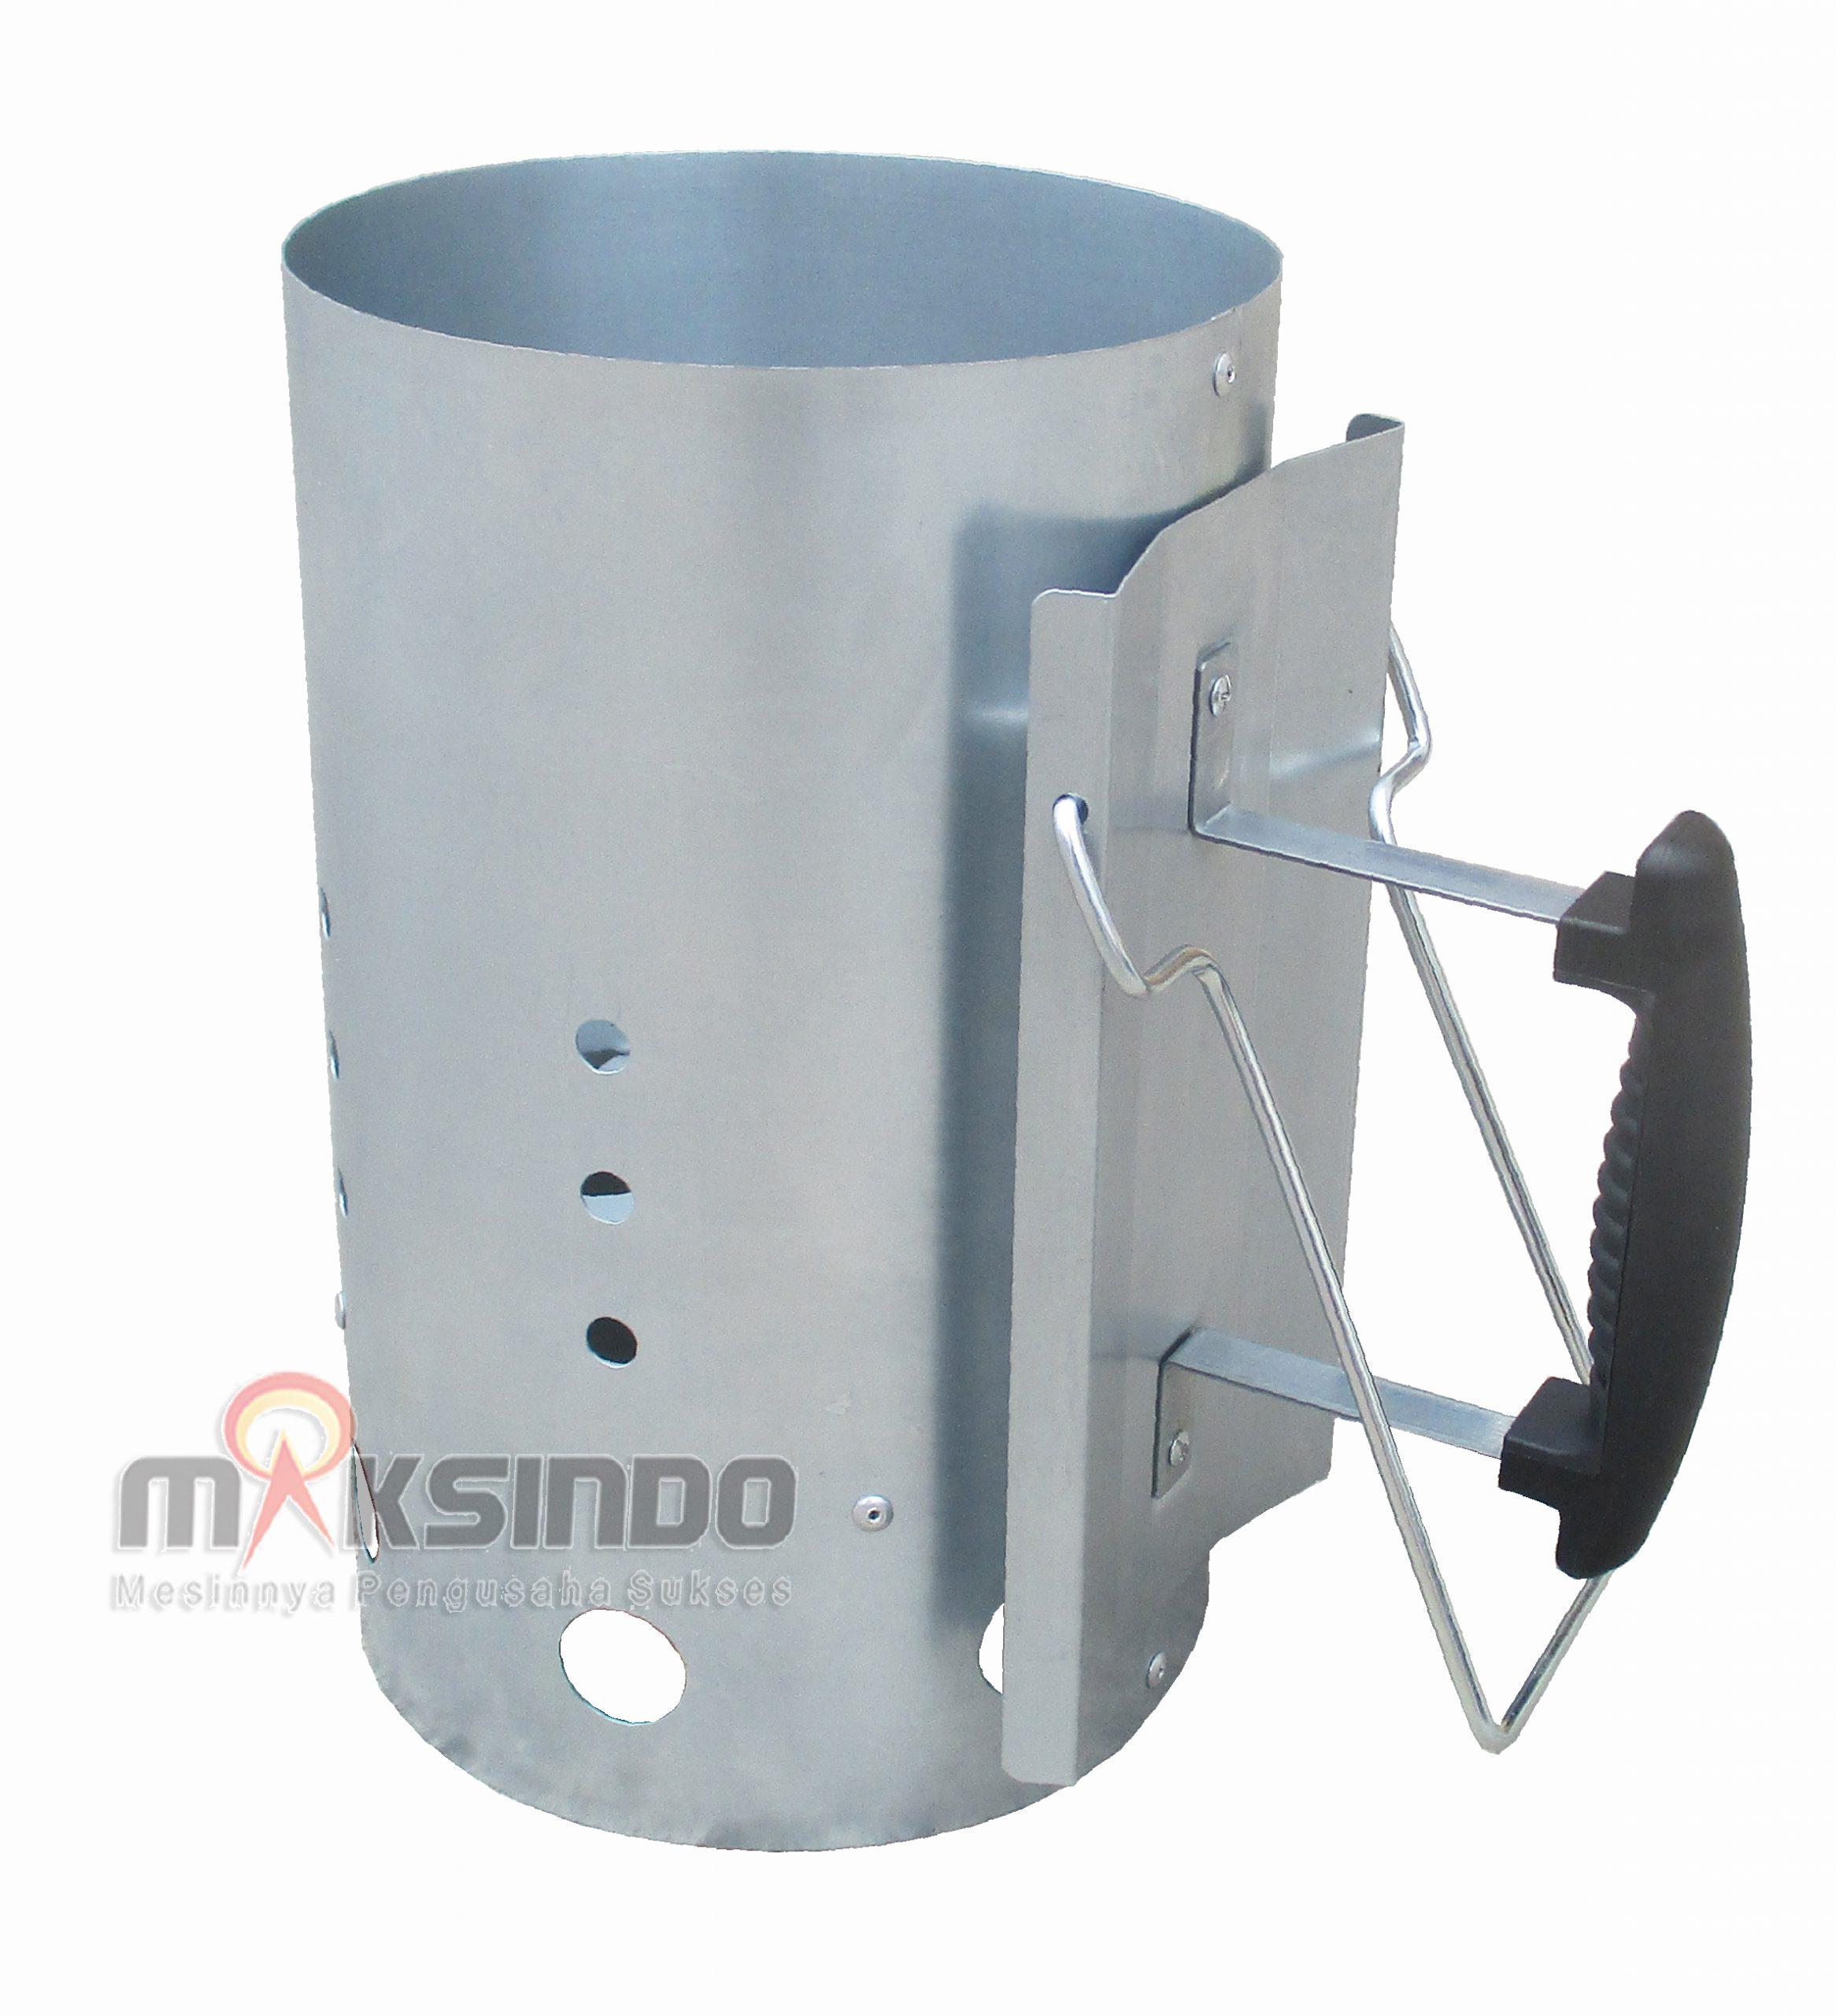 Jual Alat Untuk Menyalakan Arang (Charcoal Starter) MKS-CHRC1 di Blitar